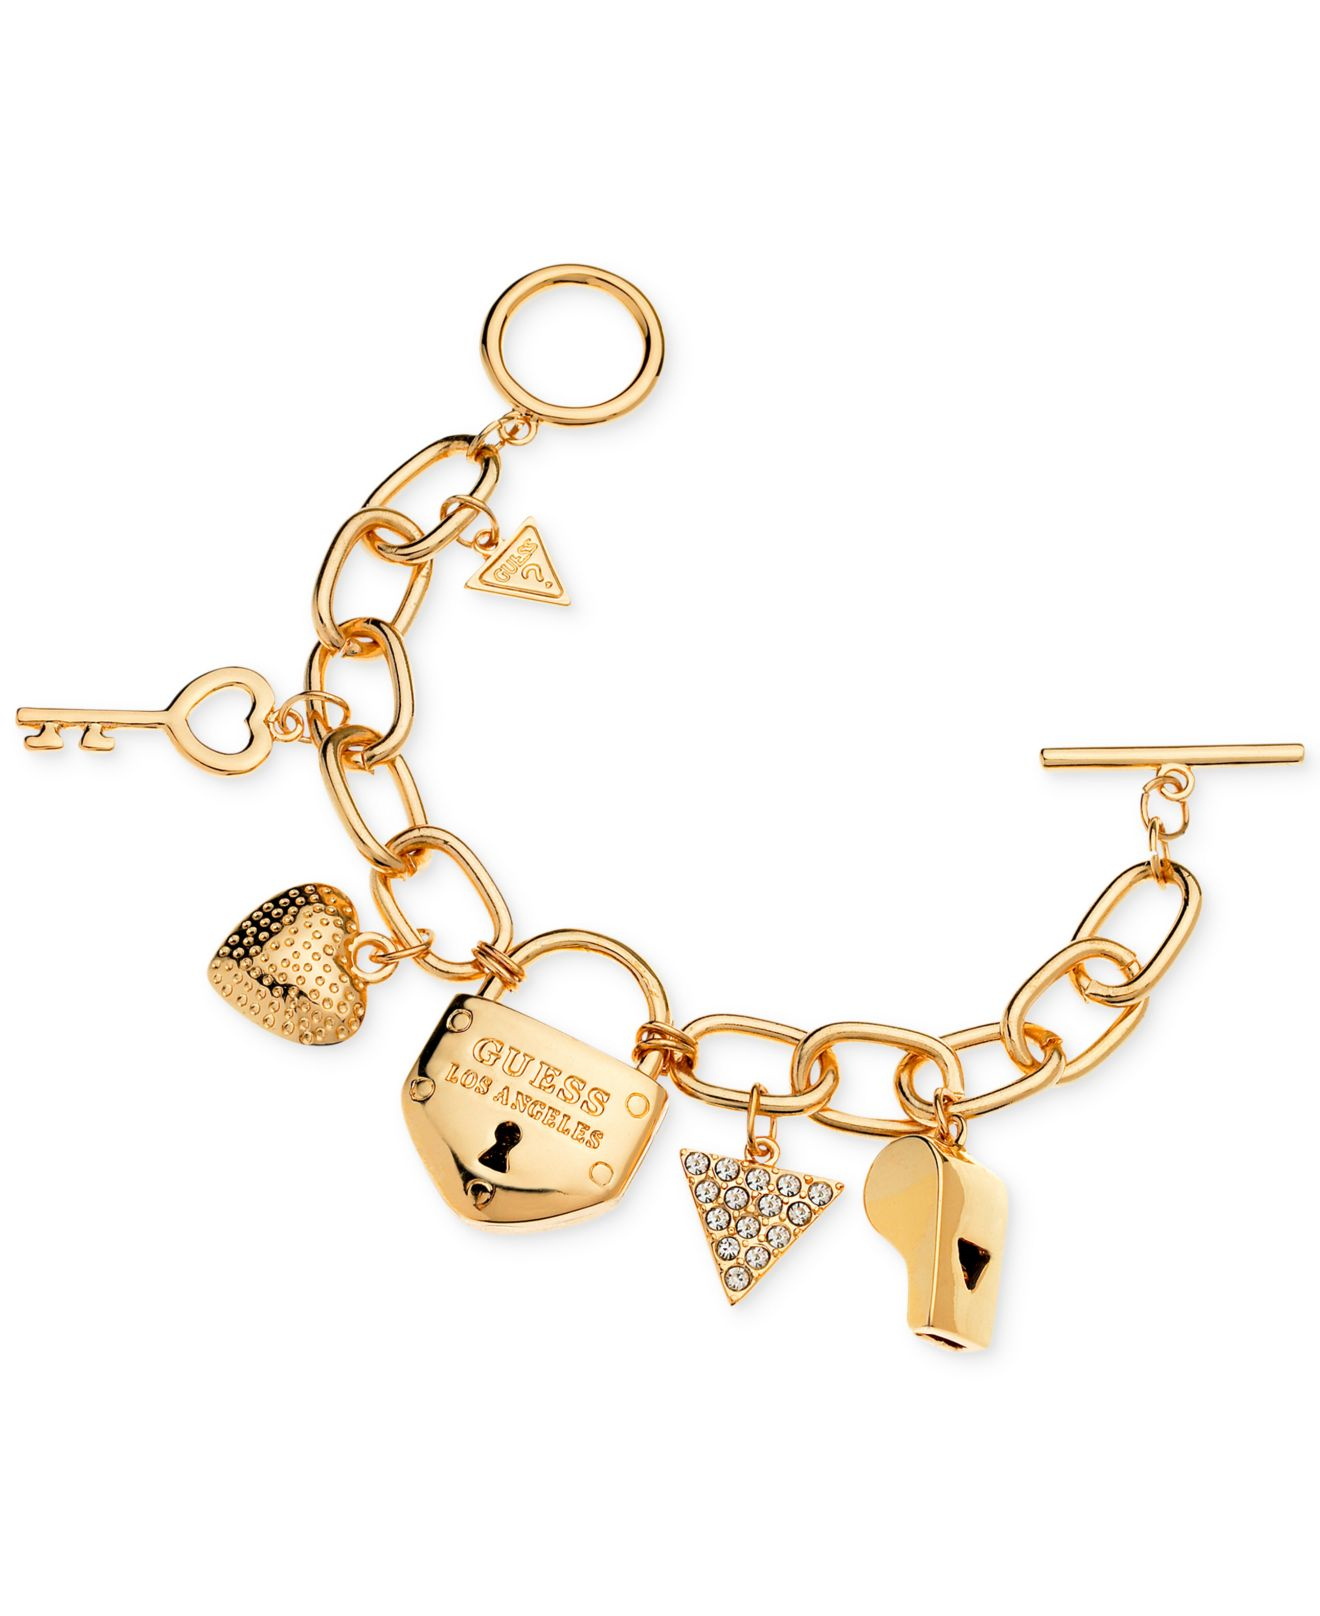 Lyst Guess Gold Tone Charm Bracelet In Metallic